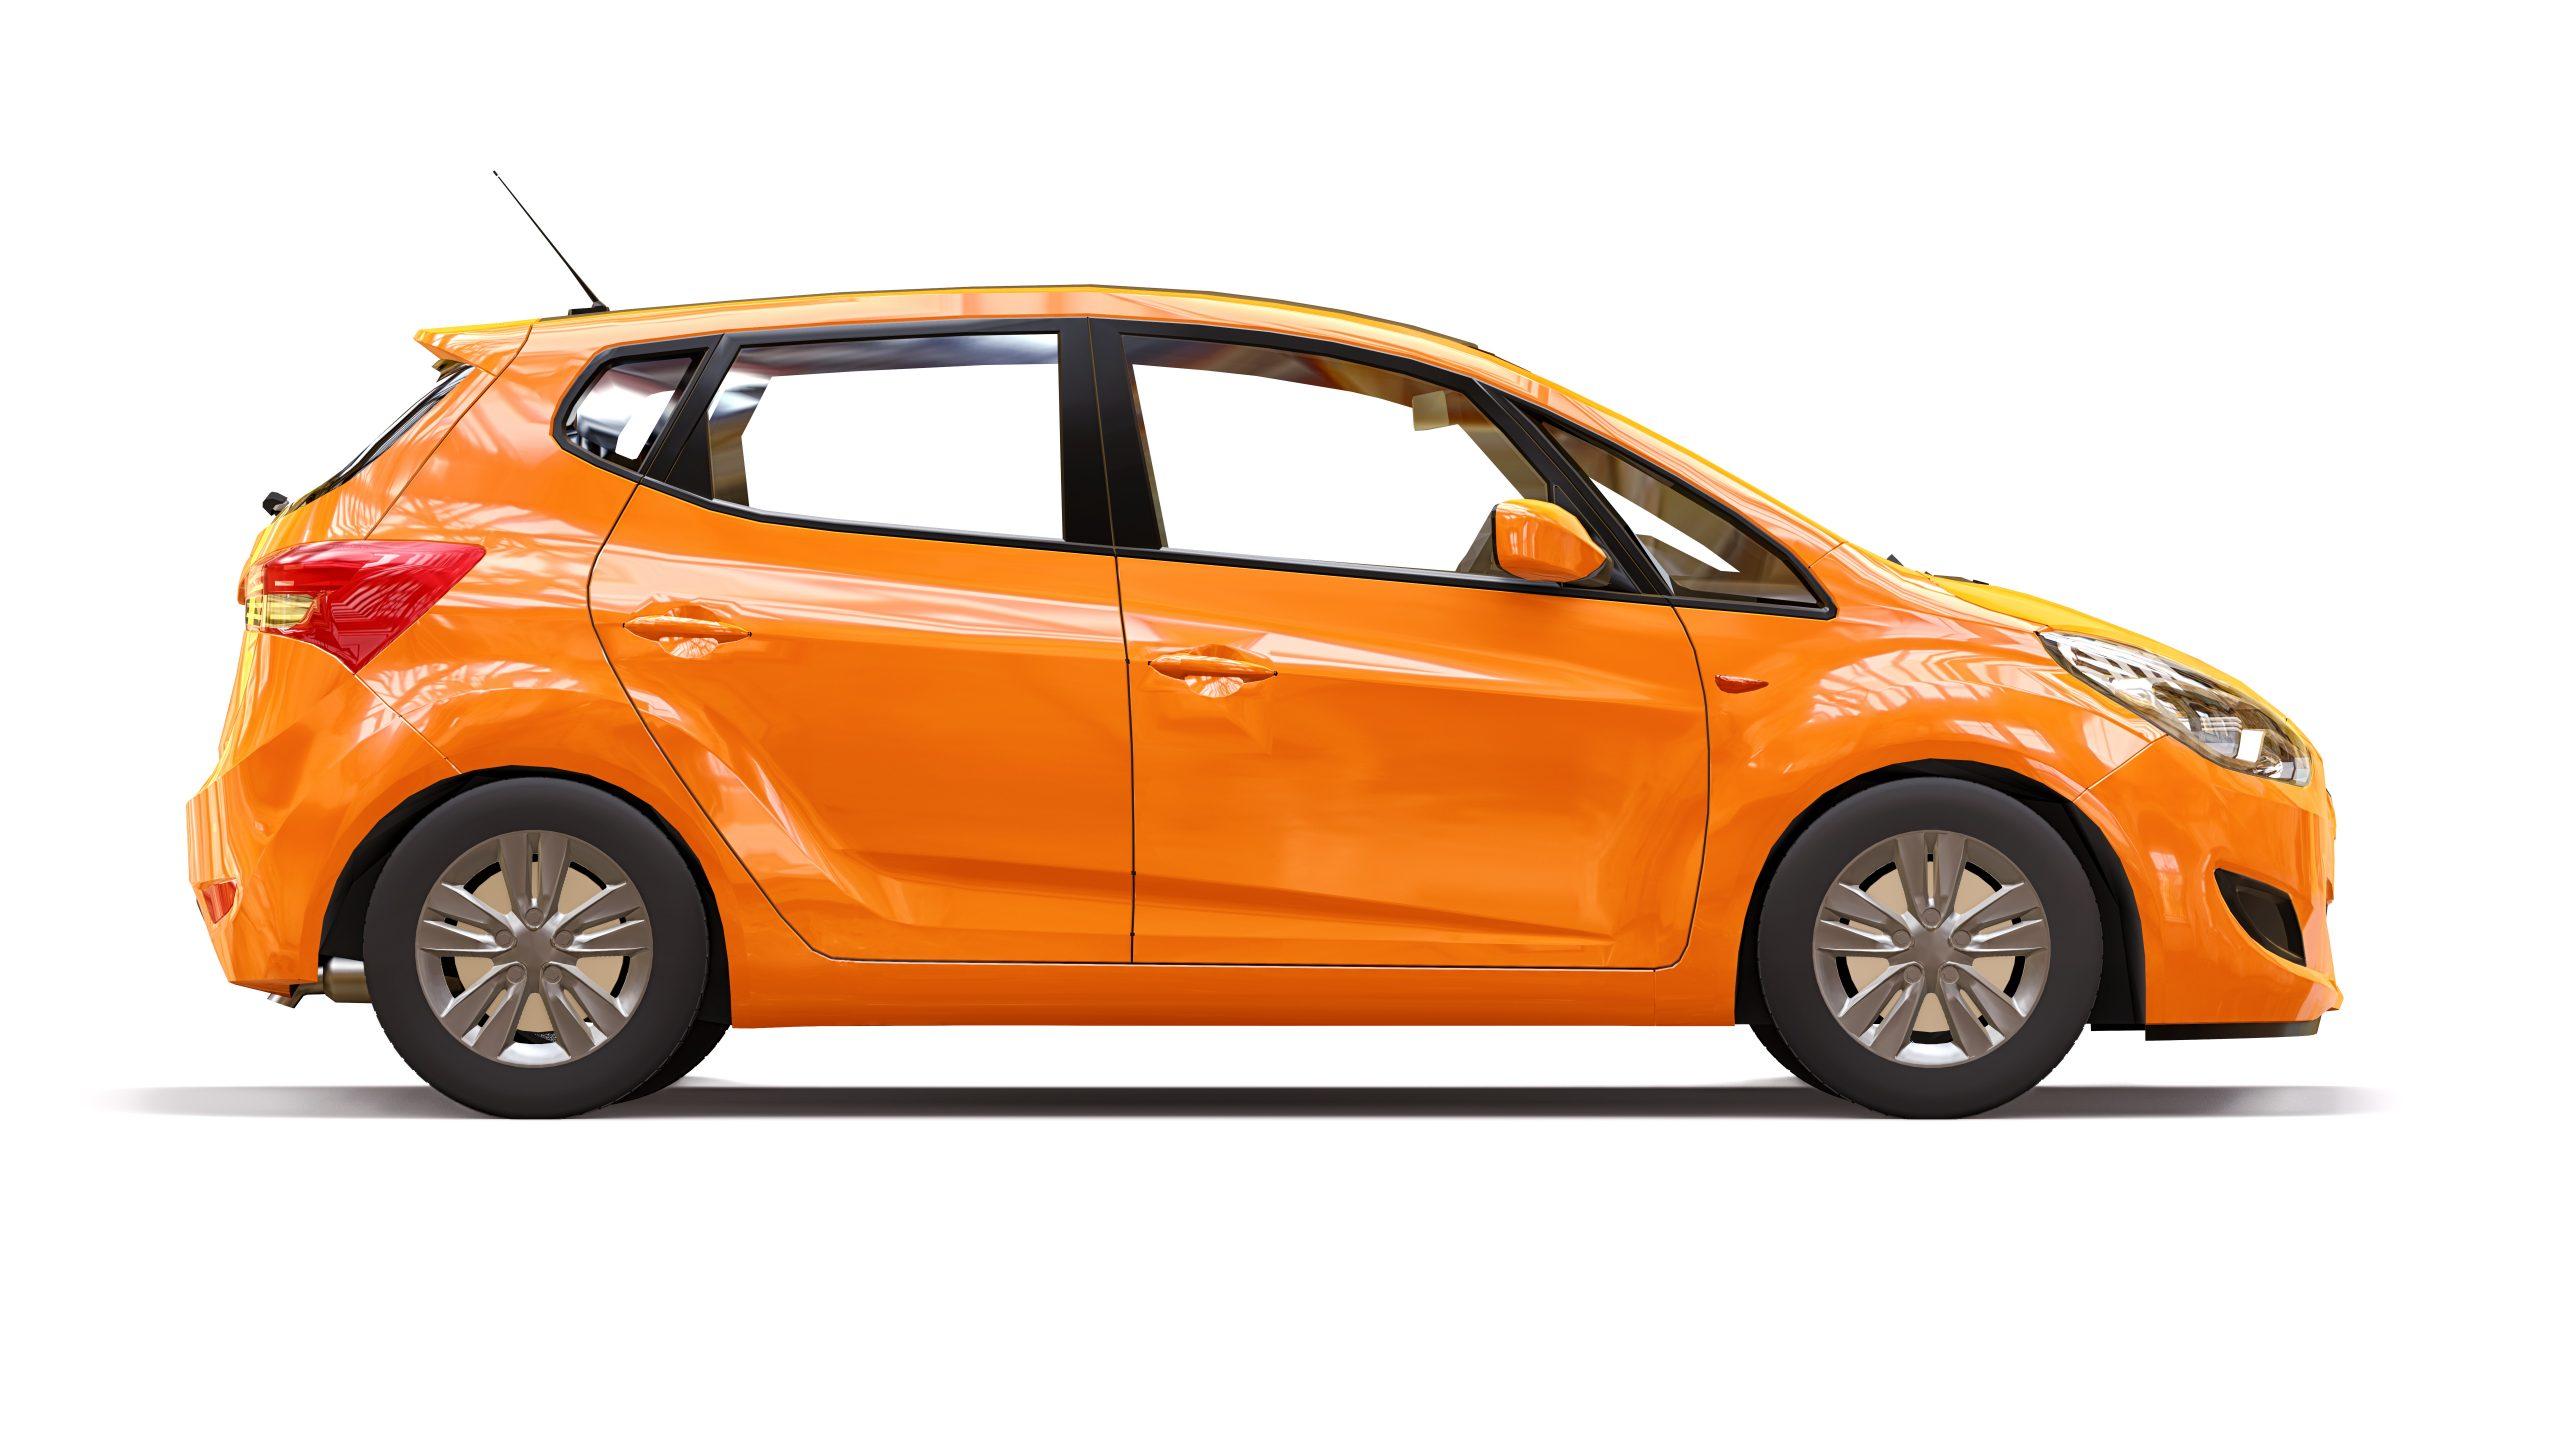 Auto Orange King Tuning